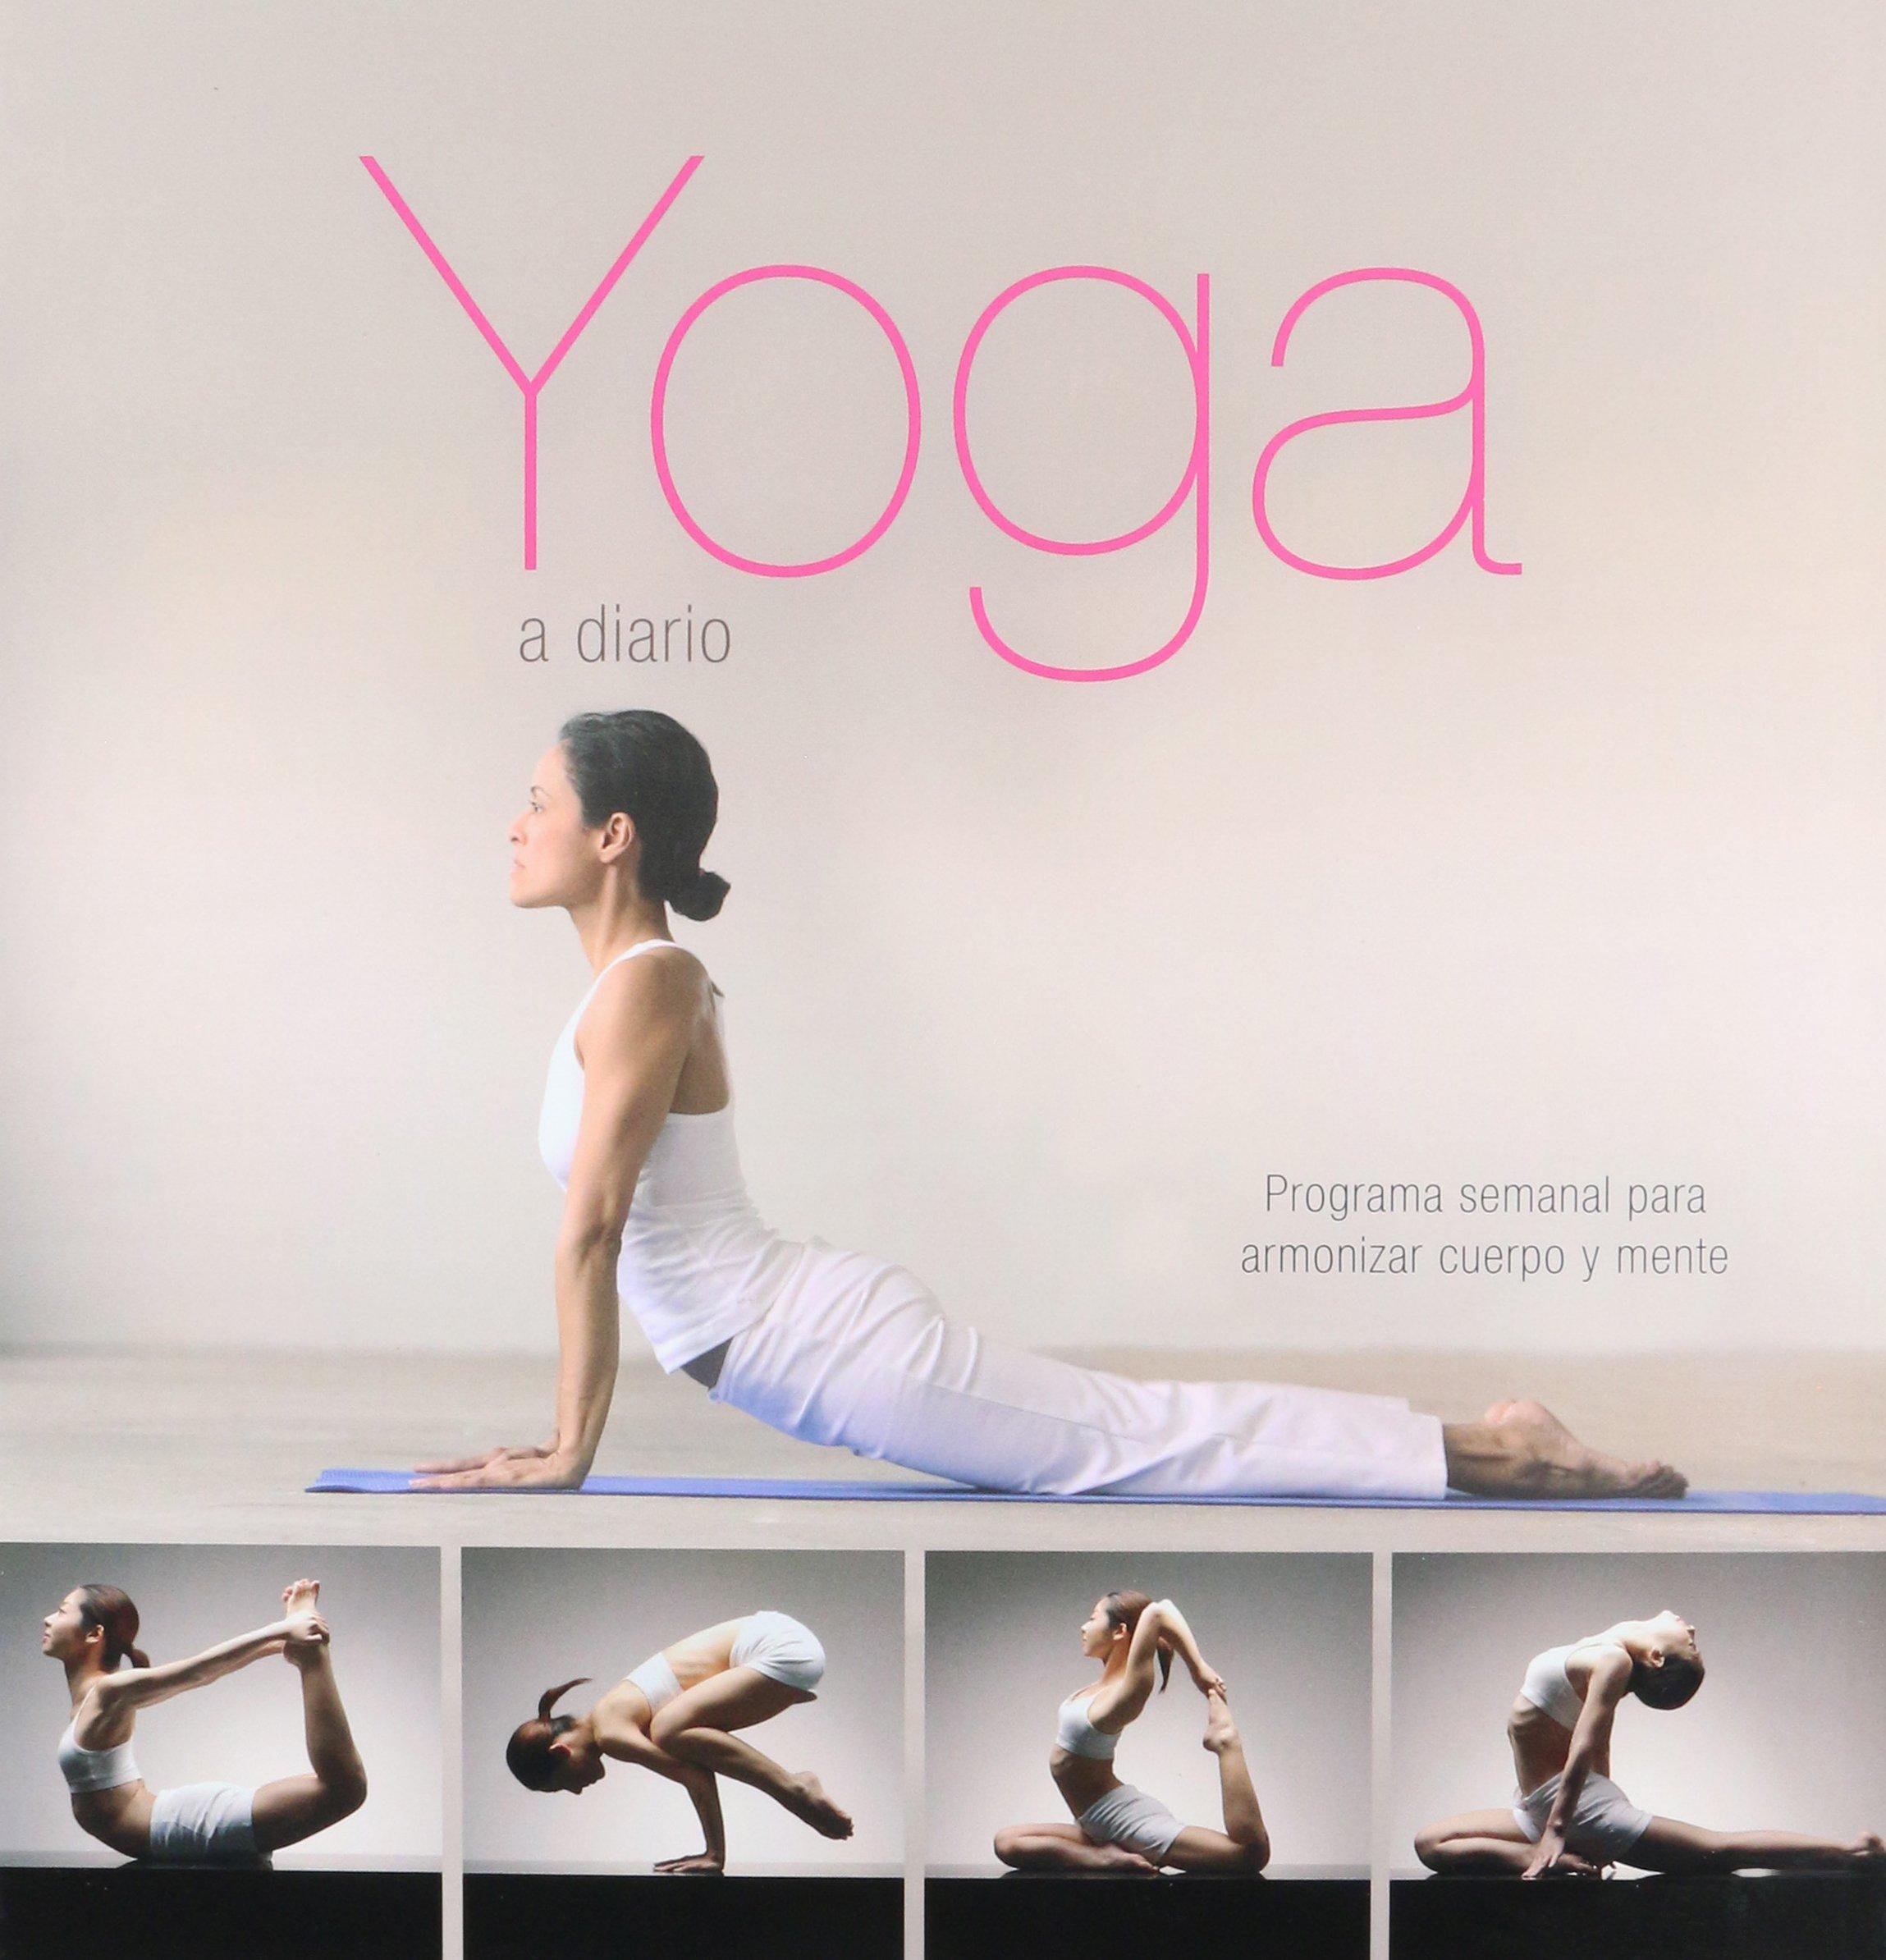 Amazon.com: Yoga a diario/ Yoga Daily Exercises: Programa ...